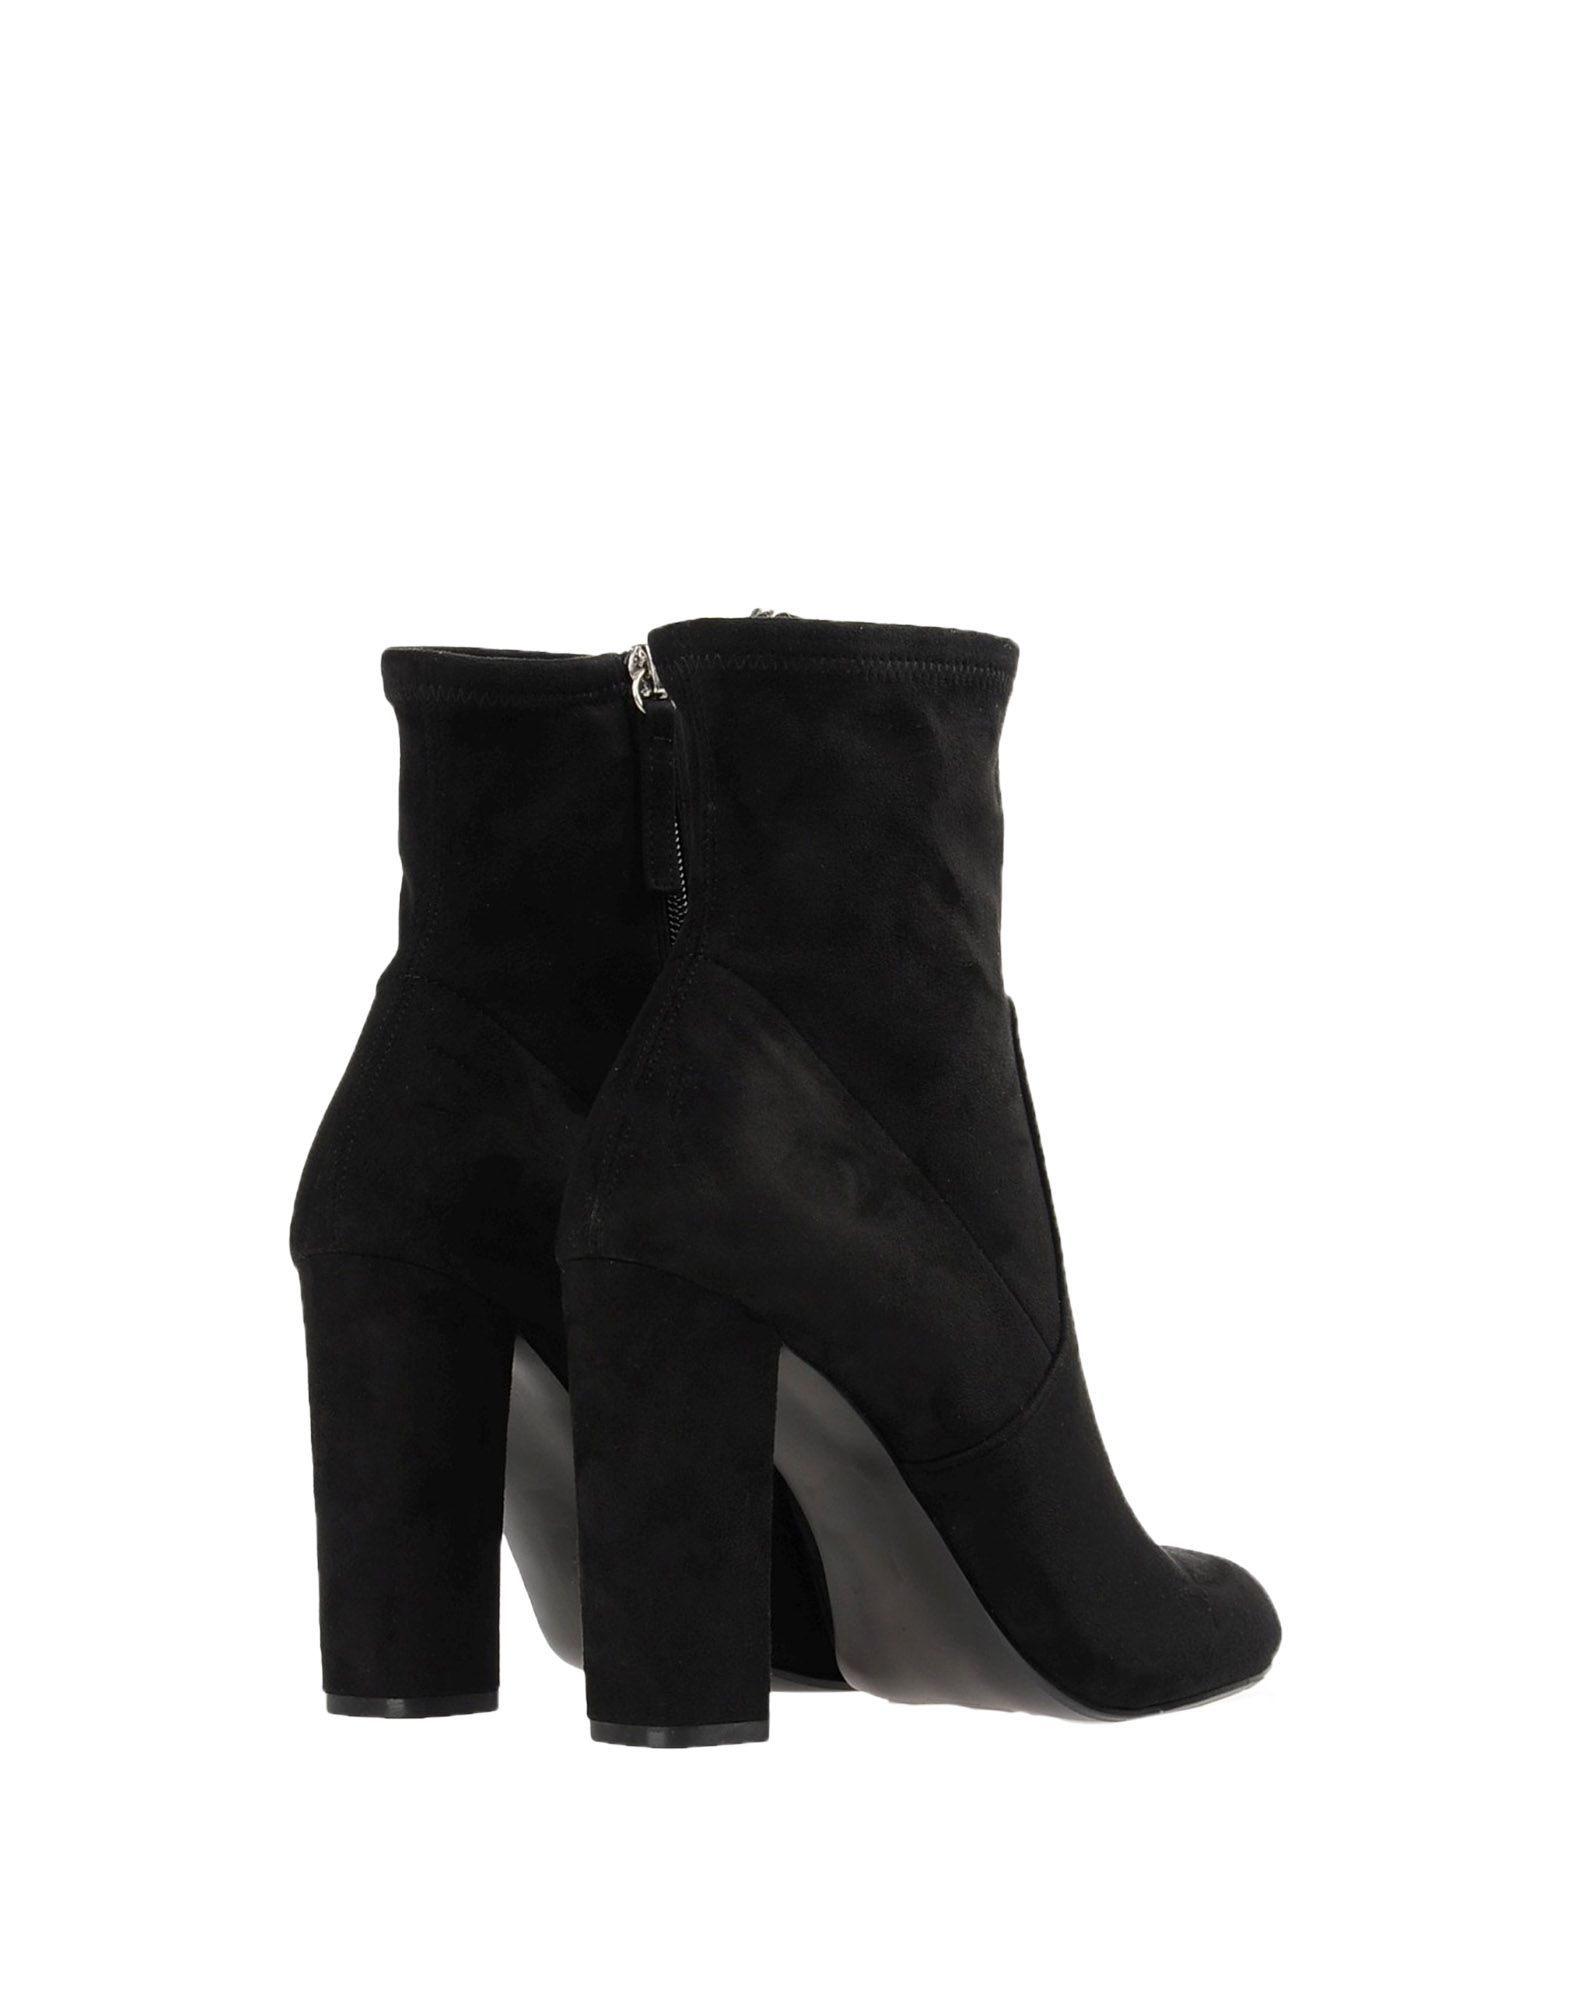 Steve Madden Stiefelette Damen  11359888QH Neue Schuhe Schuhe Schuhe 9a27ea